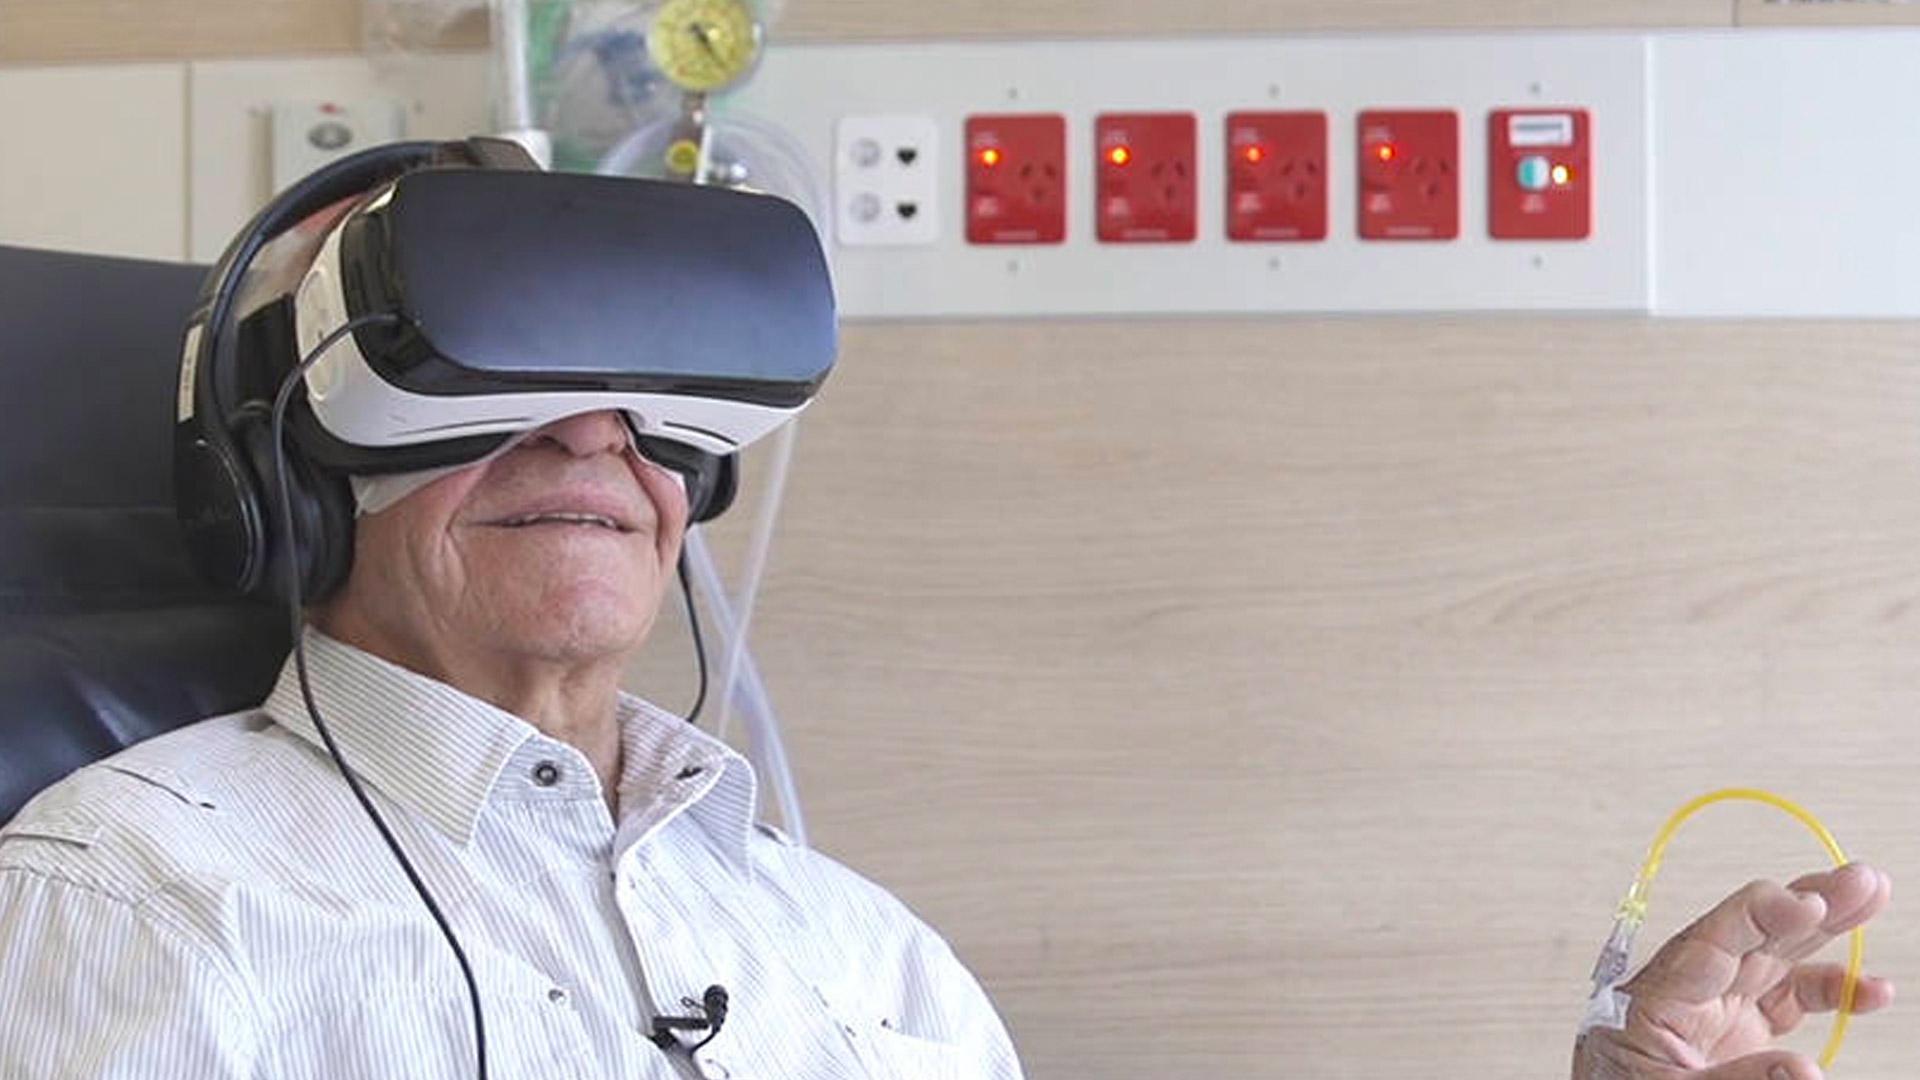 Chris O'Brien Lifehouse VR Therapy Trial Hero